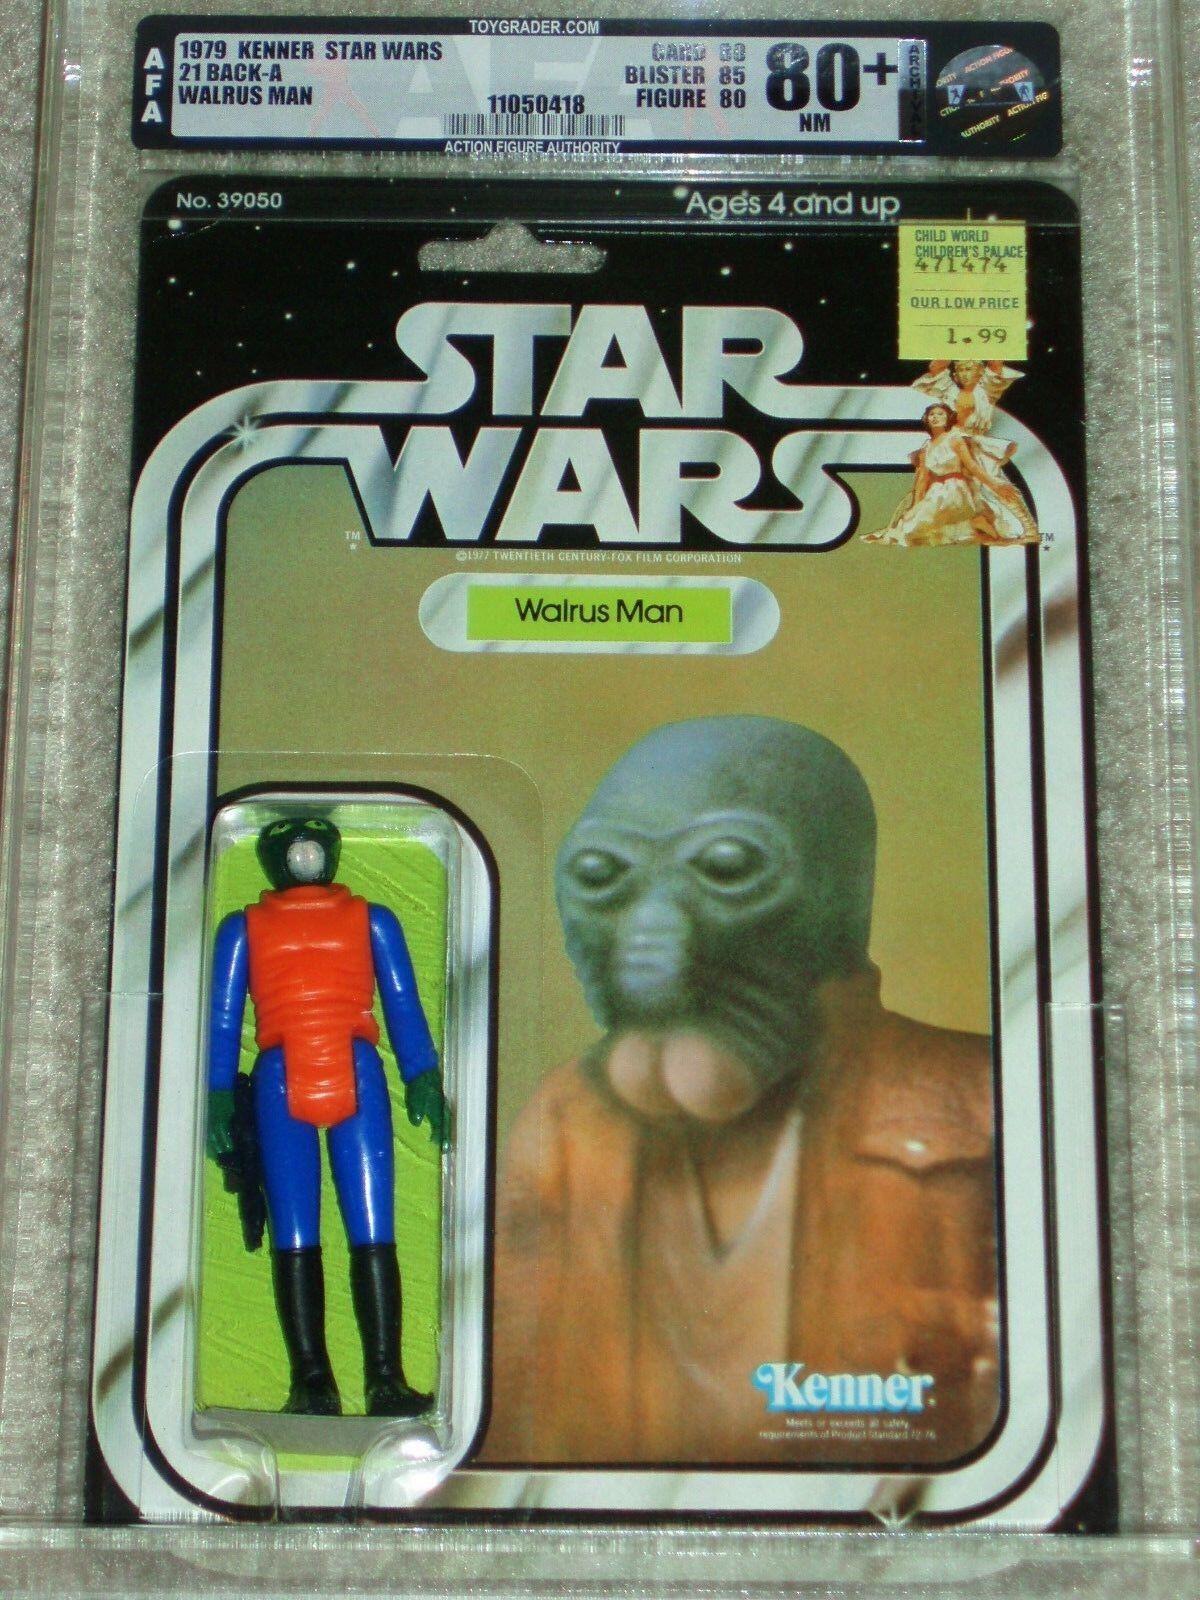 Retro Star Wars Kenner 1979 AFA 80+ Morsa hombre Anh 21 Back-una clara burbuja Moc